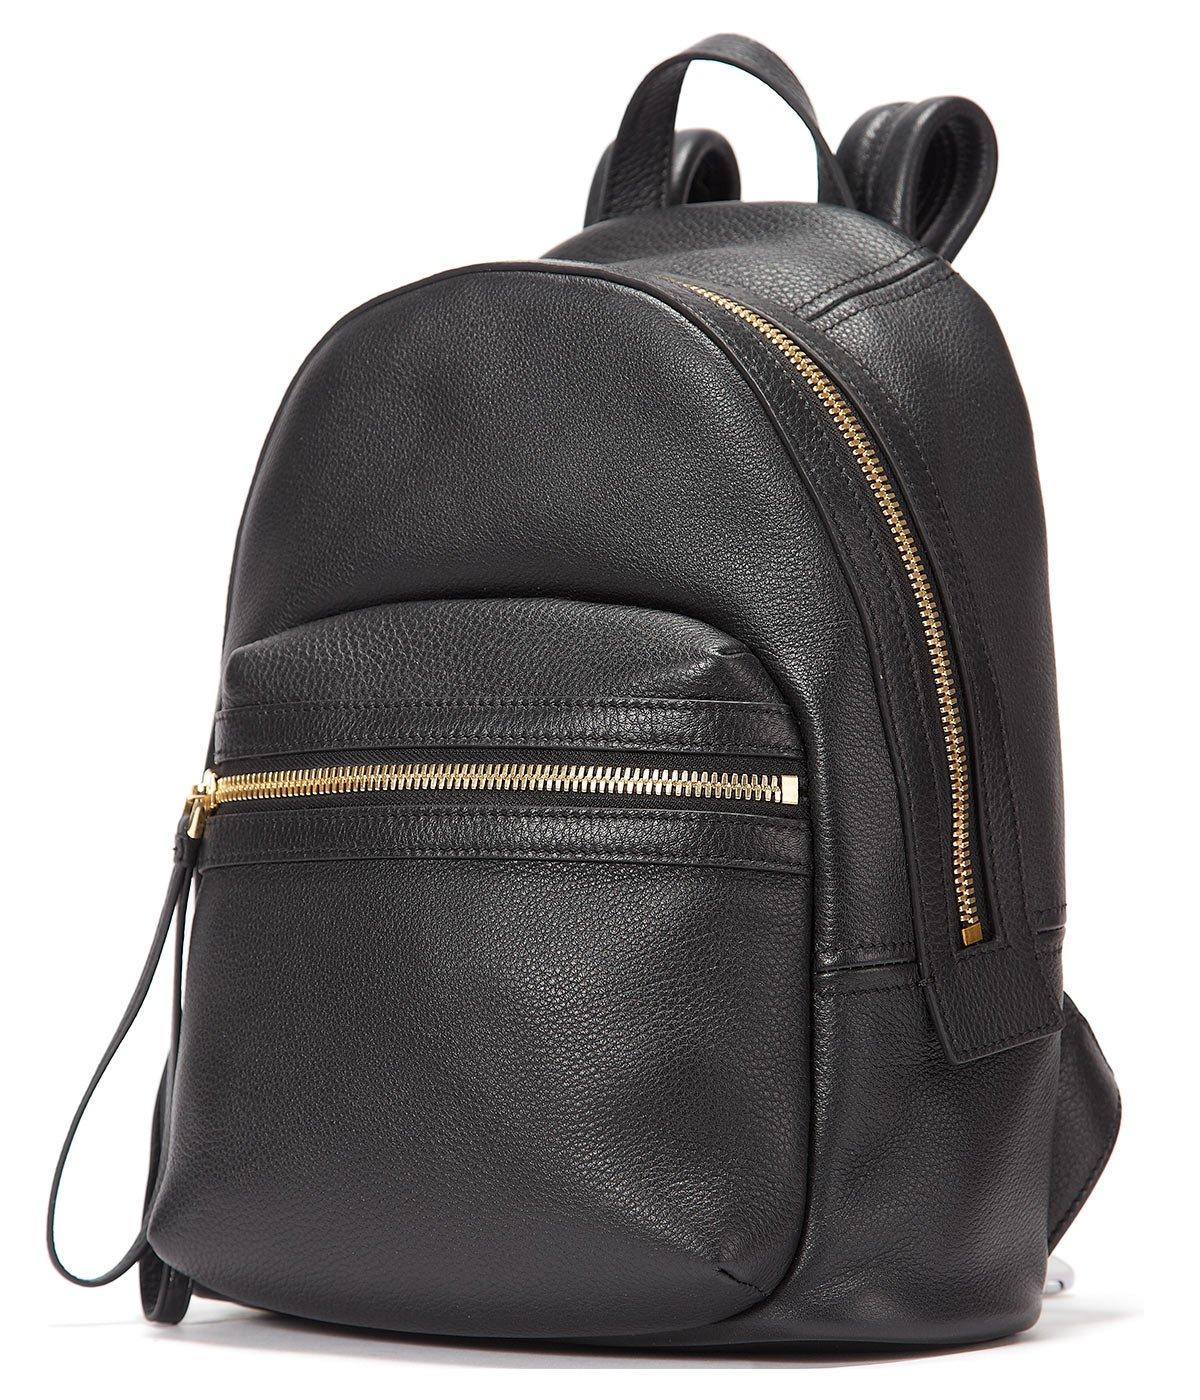 EMINI HOUSE Women Genuine Leather Backpack School Bag Girls Ladies Daily Purse Travel Bag Rucksack-Black